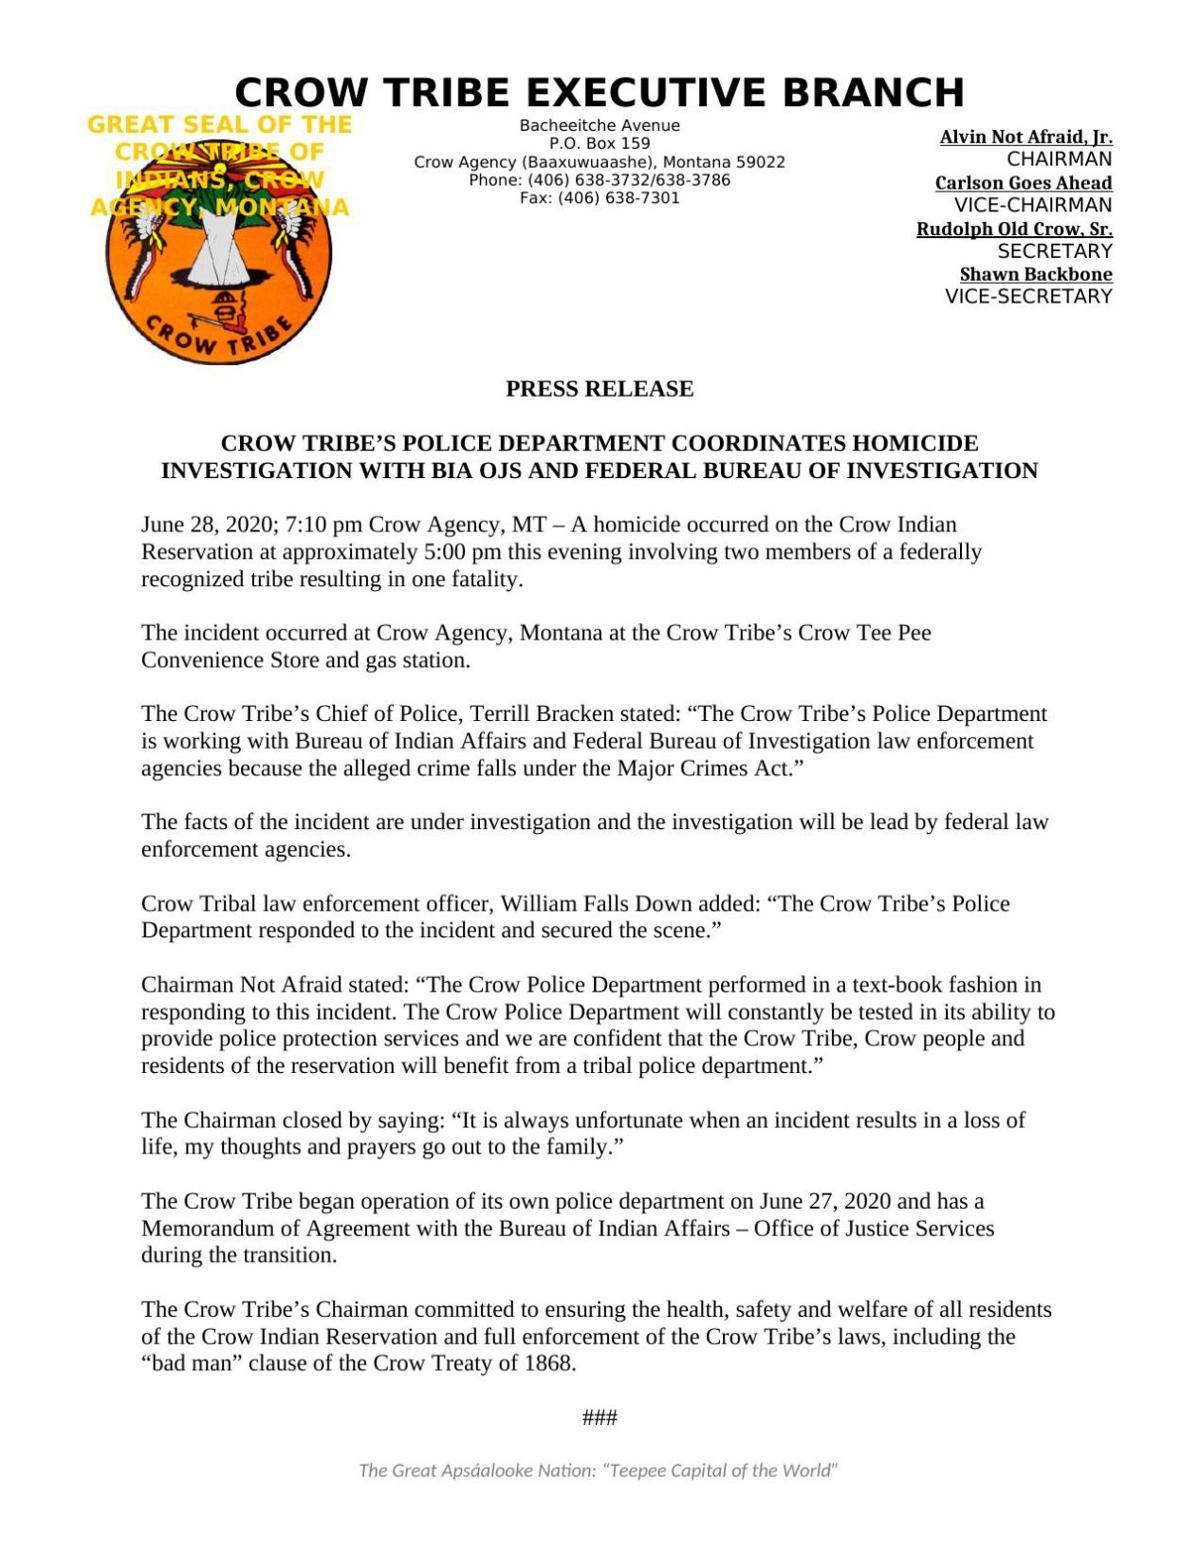 Homicide investigation underway on Crow Reservation